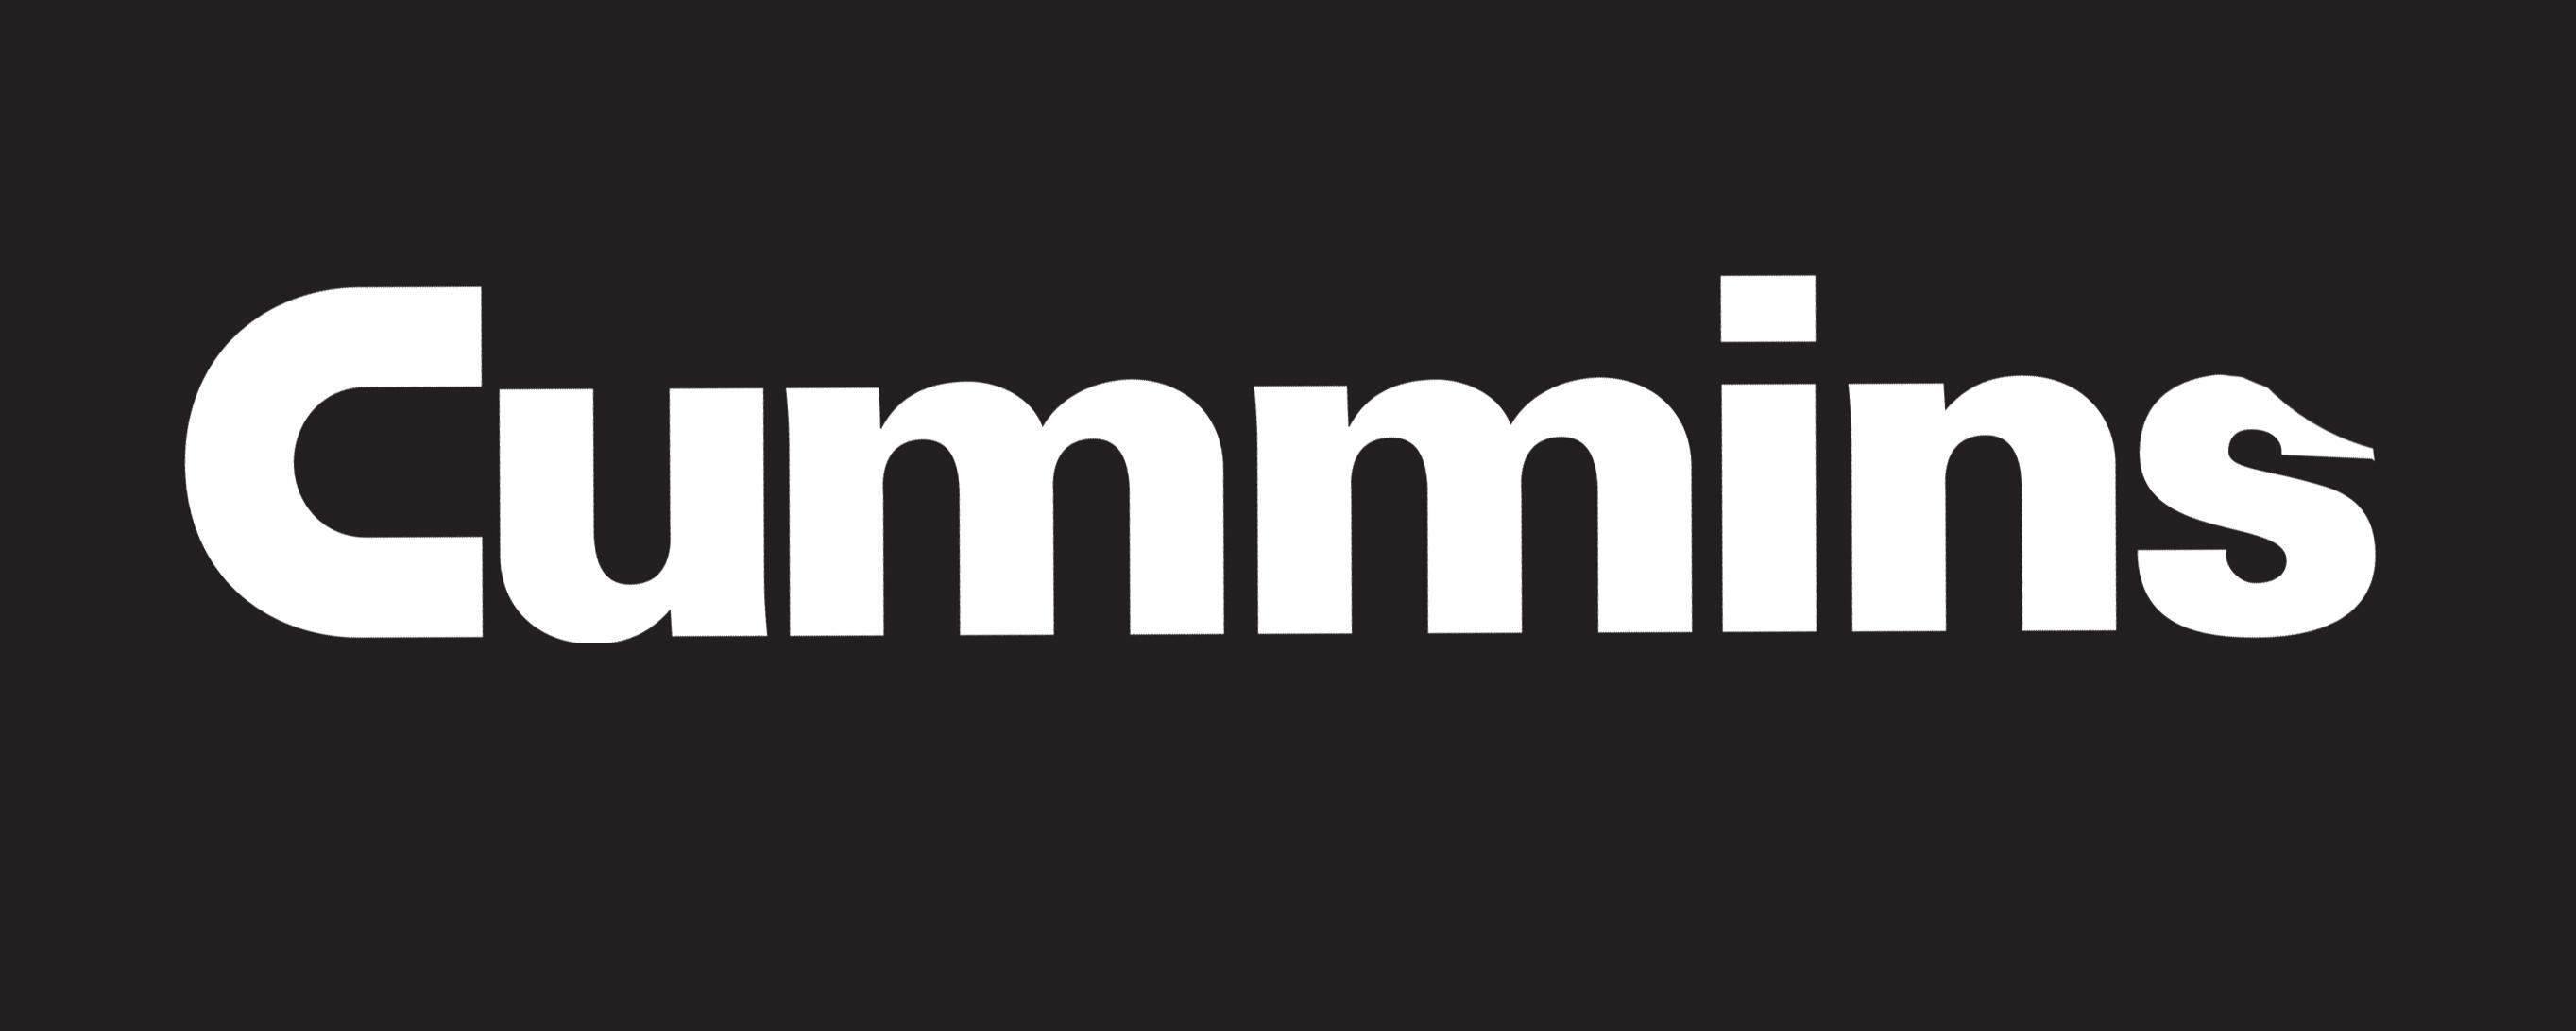 Cummins Logo Cummins Symbol Meaning History And Evolution